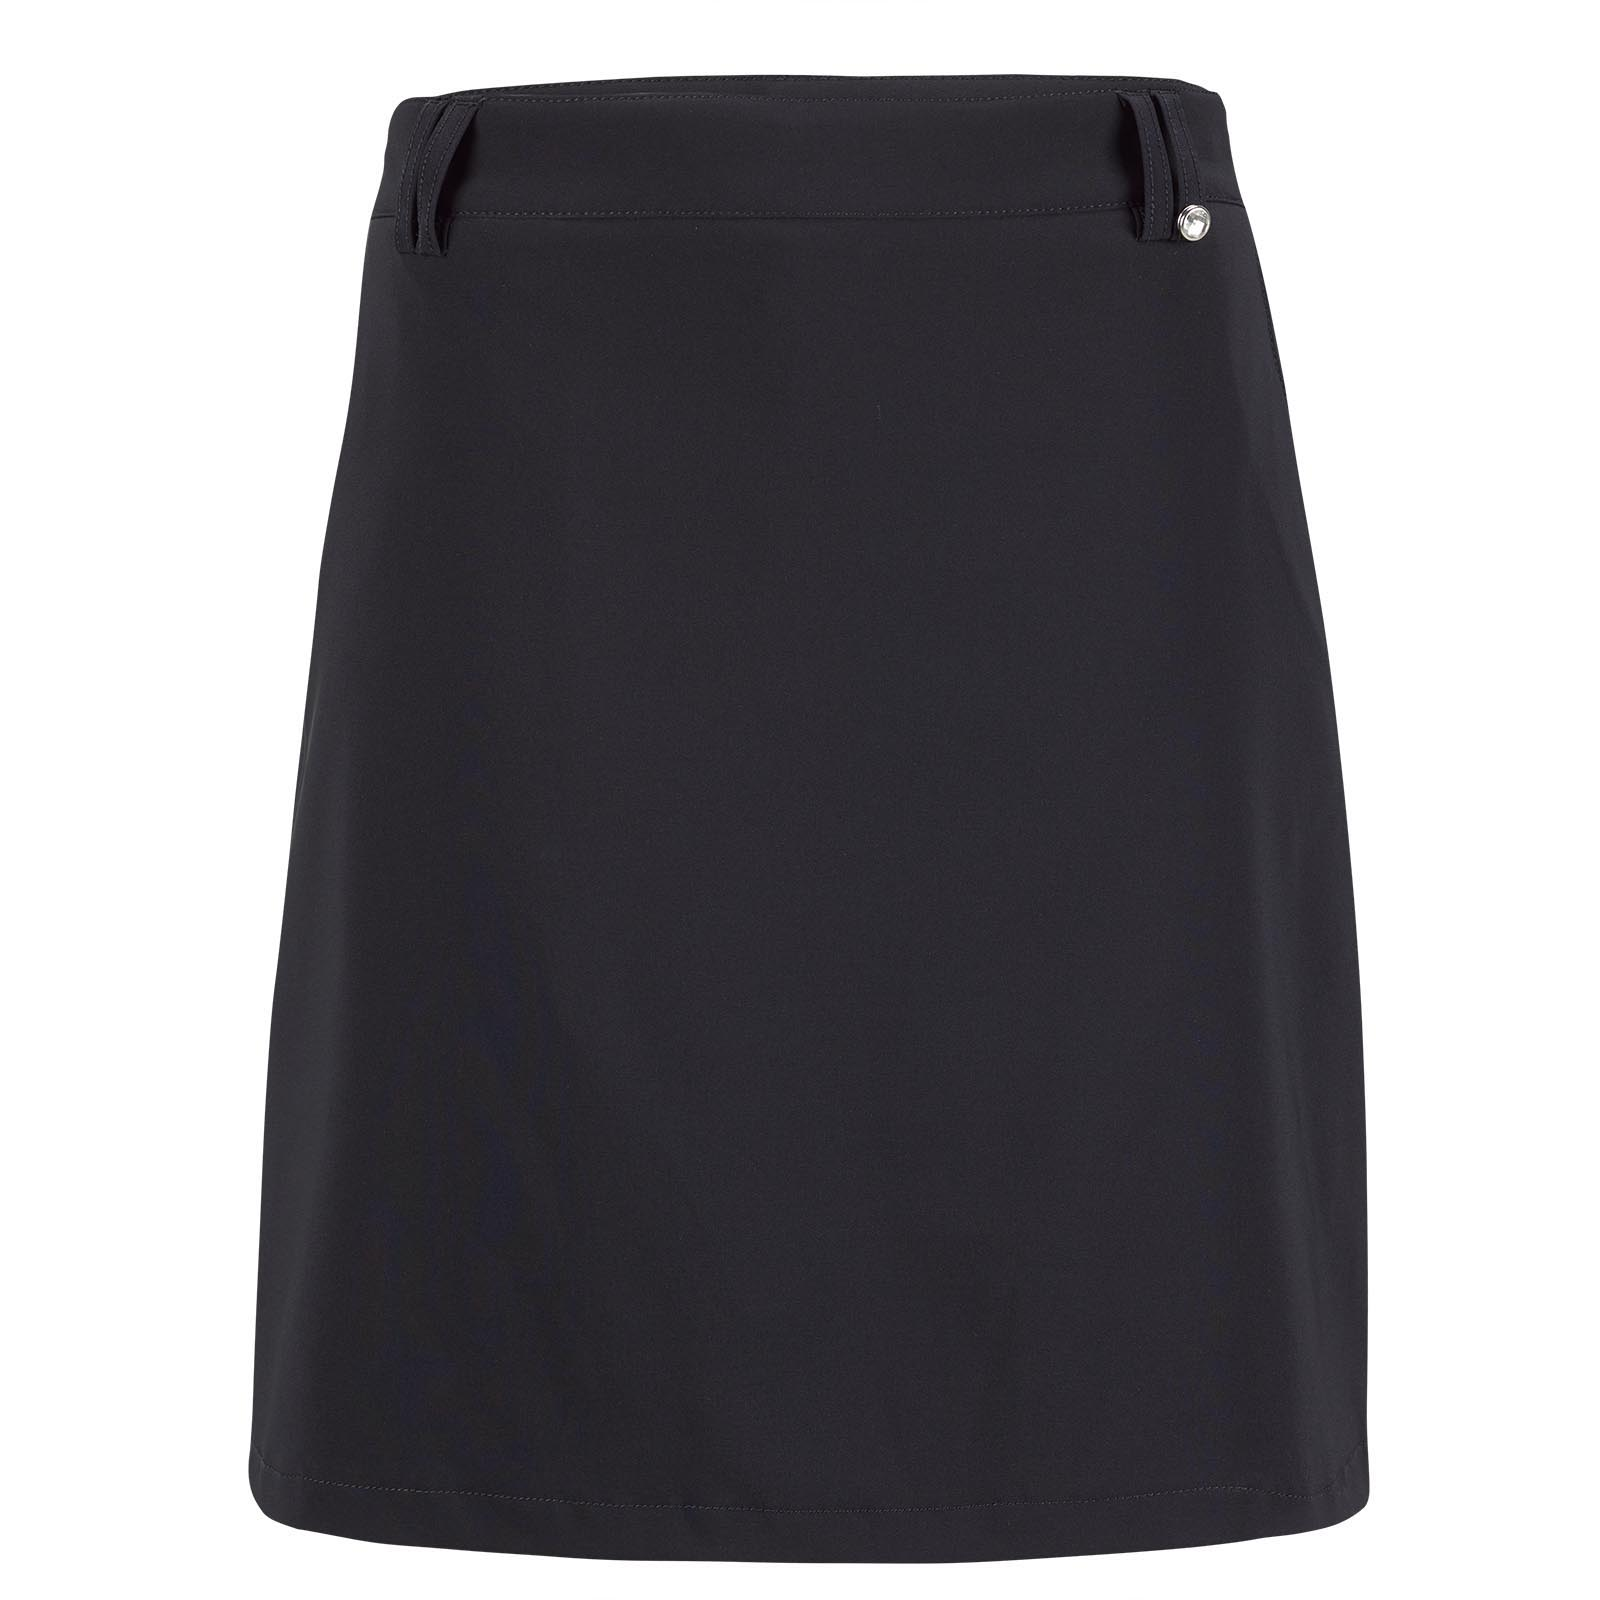 Falda pantalón de golf para mujer de material elástico impermeable